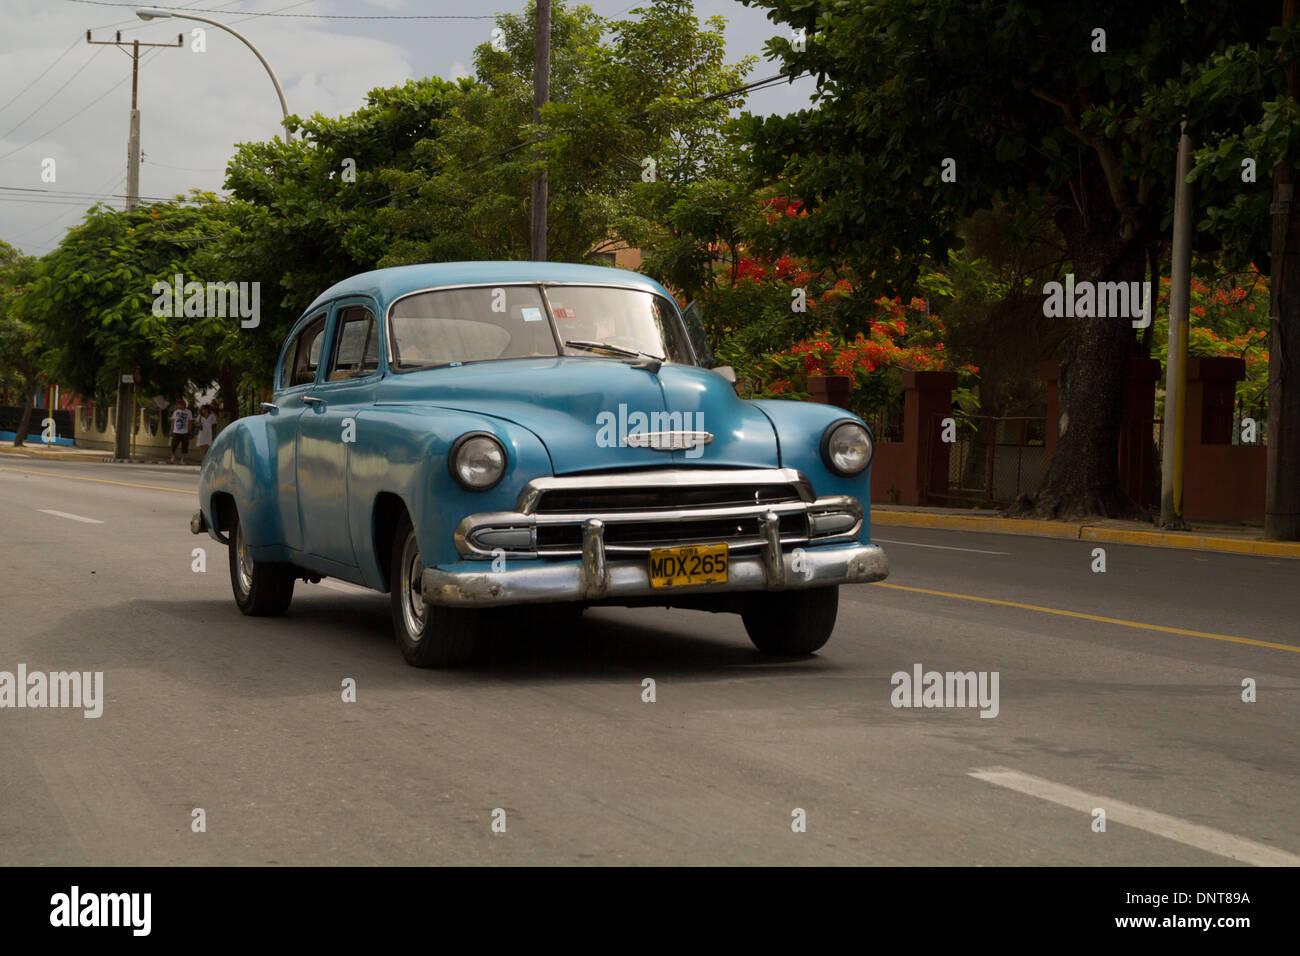 Cuban Cars in 2013 - Stock Image